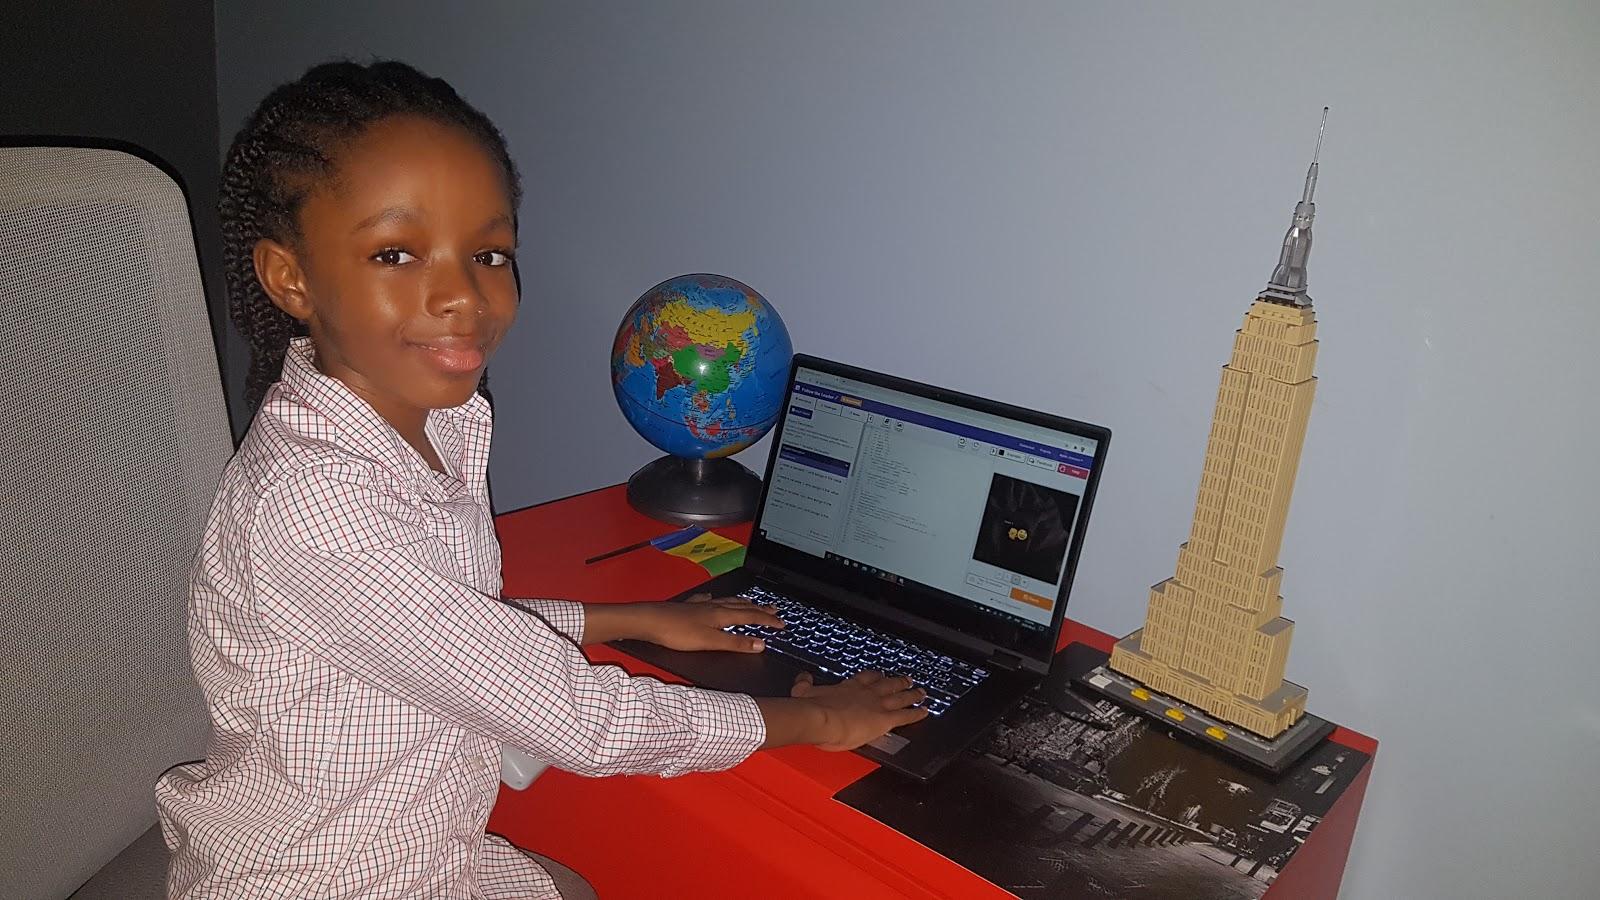 Nyles at his computer, coding.